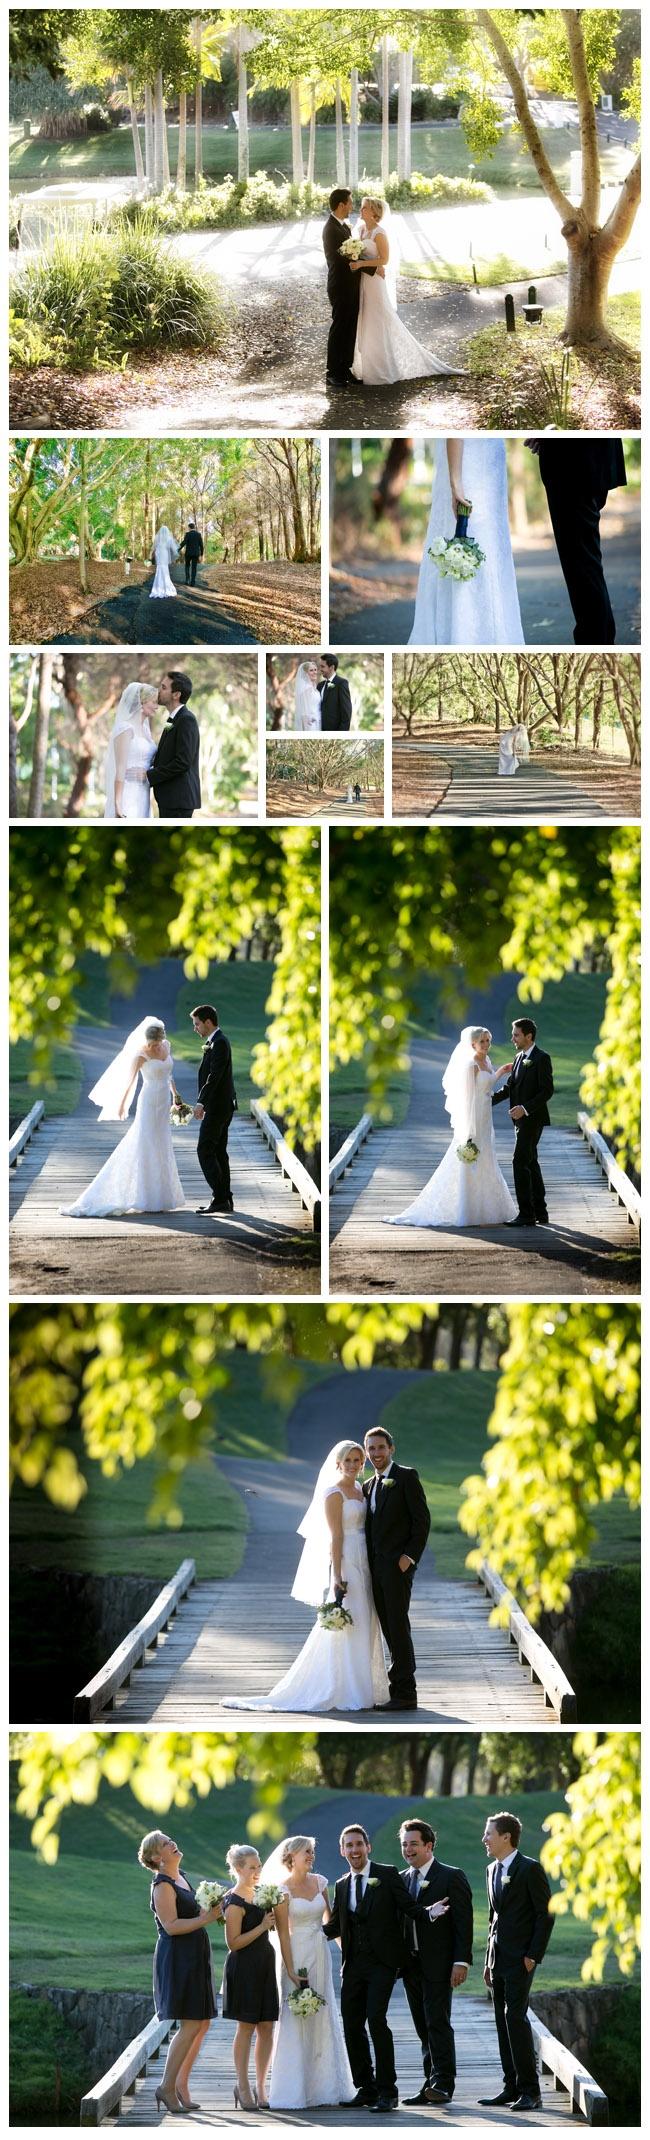 Stephanie & Philippe - Palmer Coolum Resort - Sunshine Coast  | focusfilms.com.au